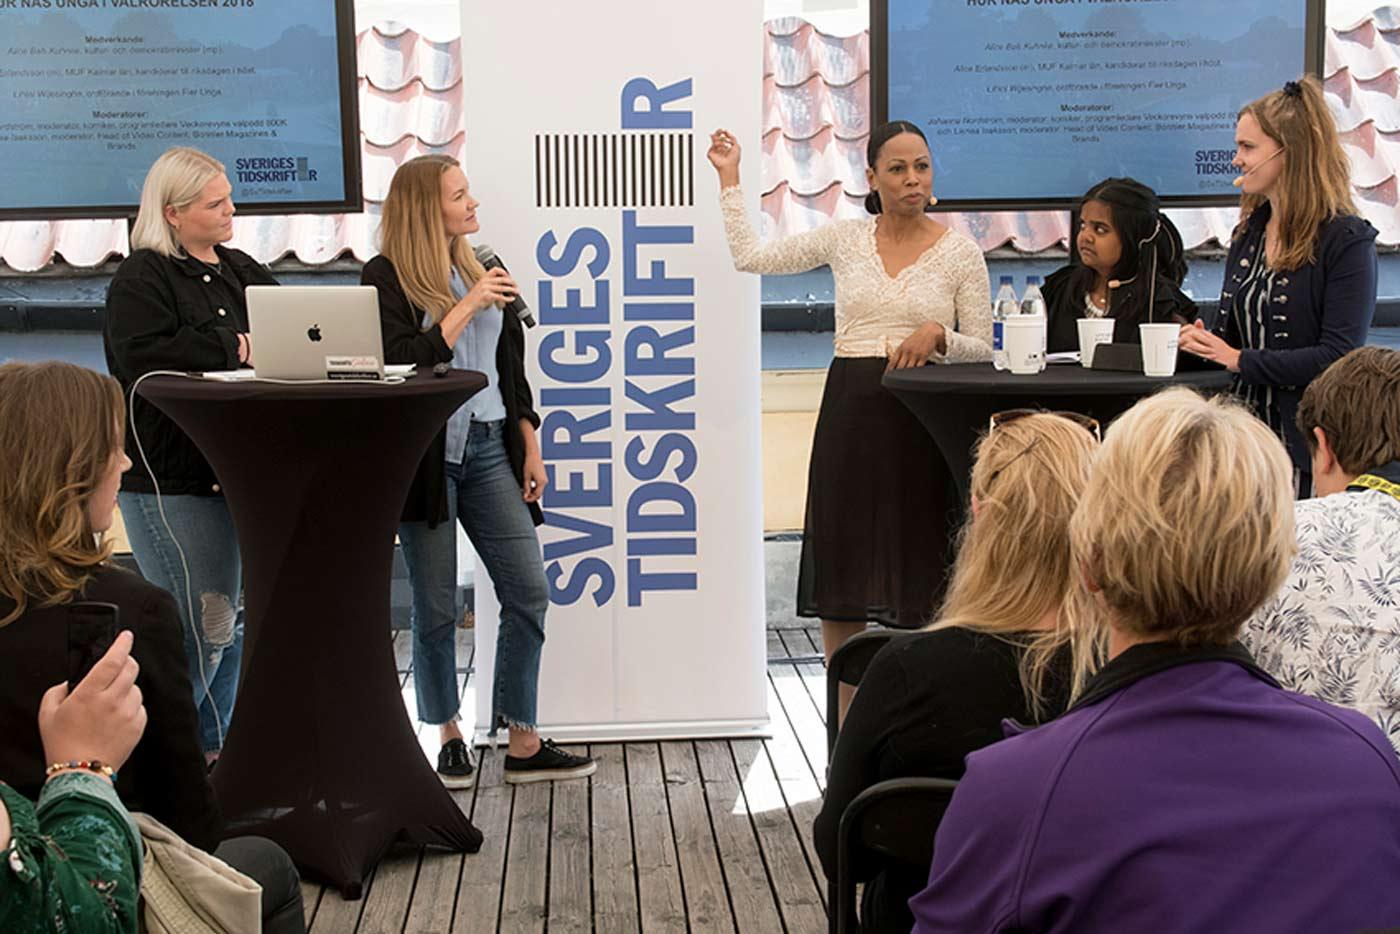 Johanna Nordström, Linnea Isaksson, Alice Bah Kuhnke, Lihini Wijesinghe och Alice Erlandsson i Almedalen 2018